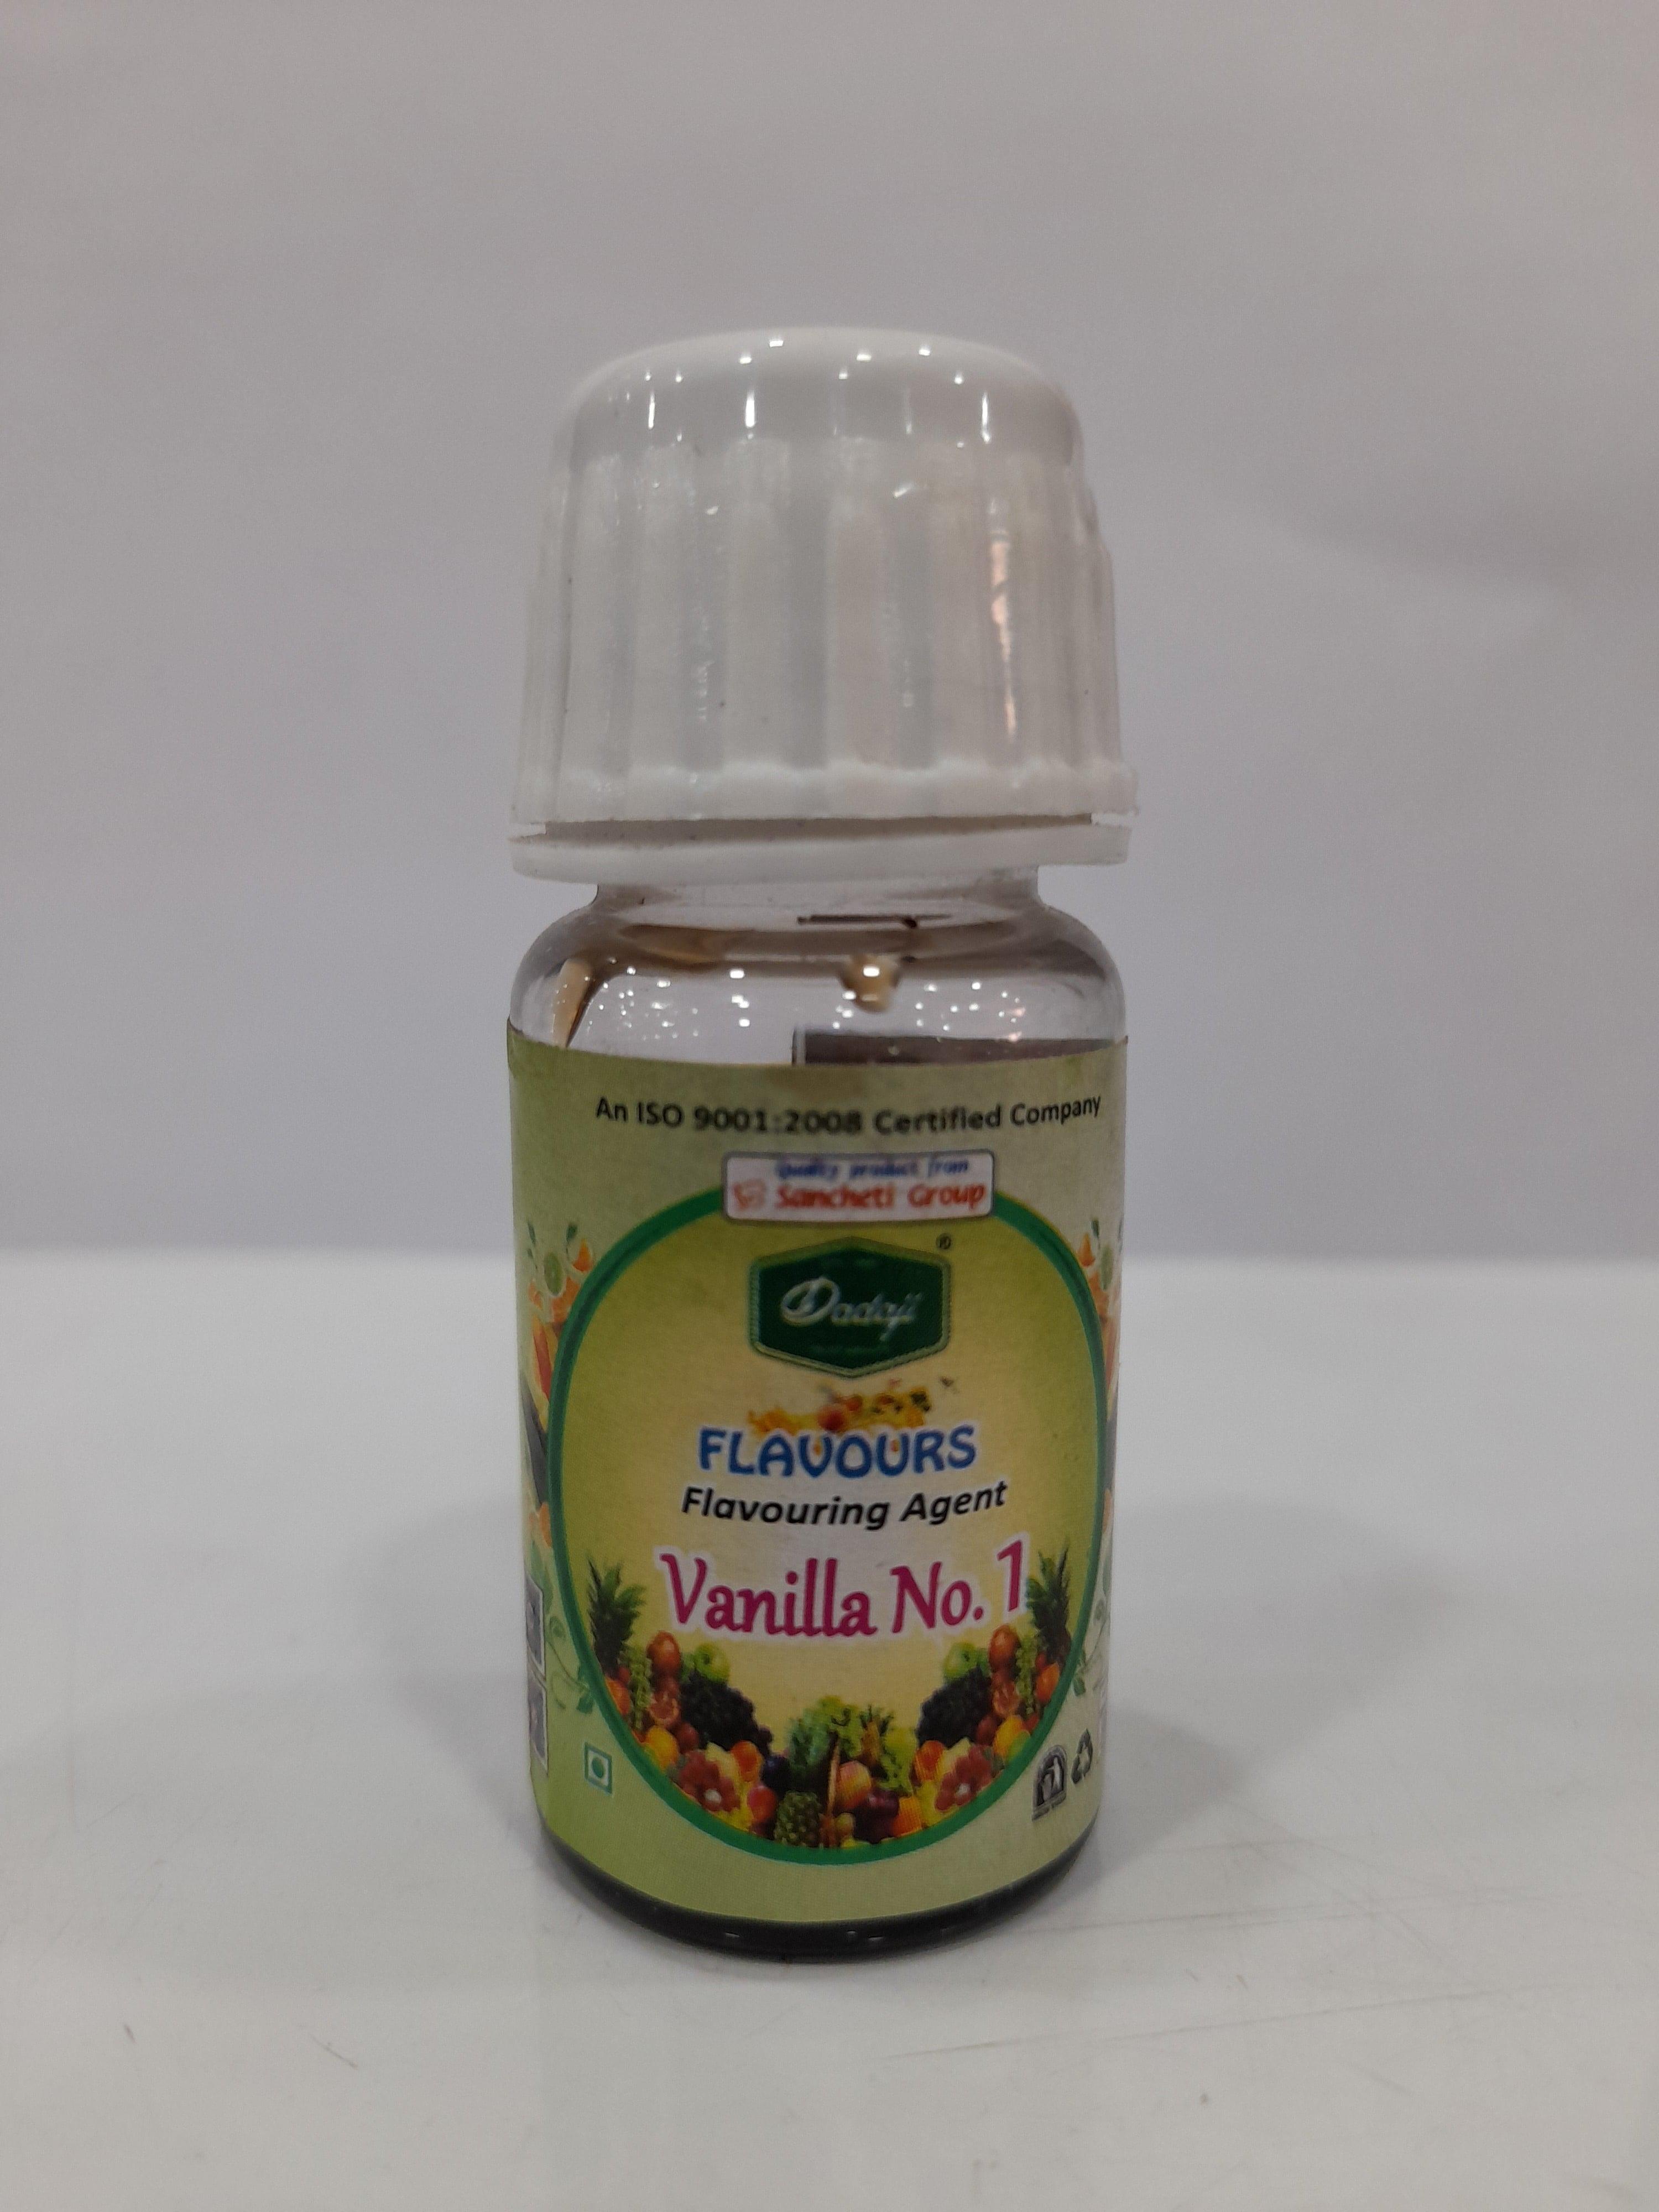 Dadaji Vanilla No 1 Flavours (Flavouring Agent)